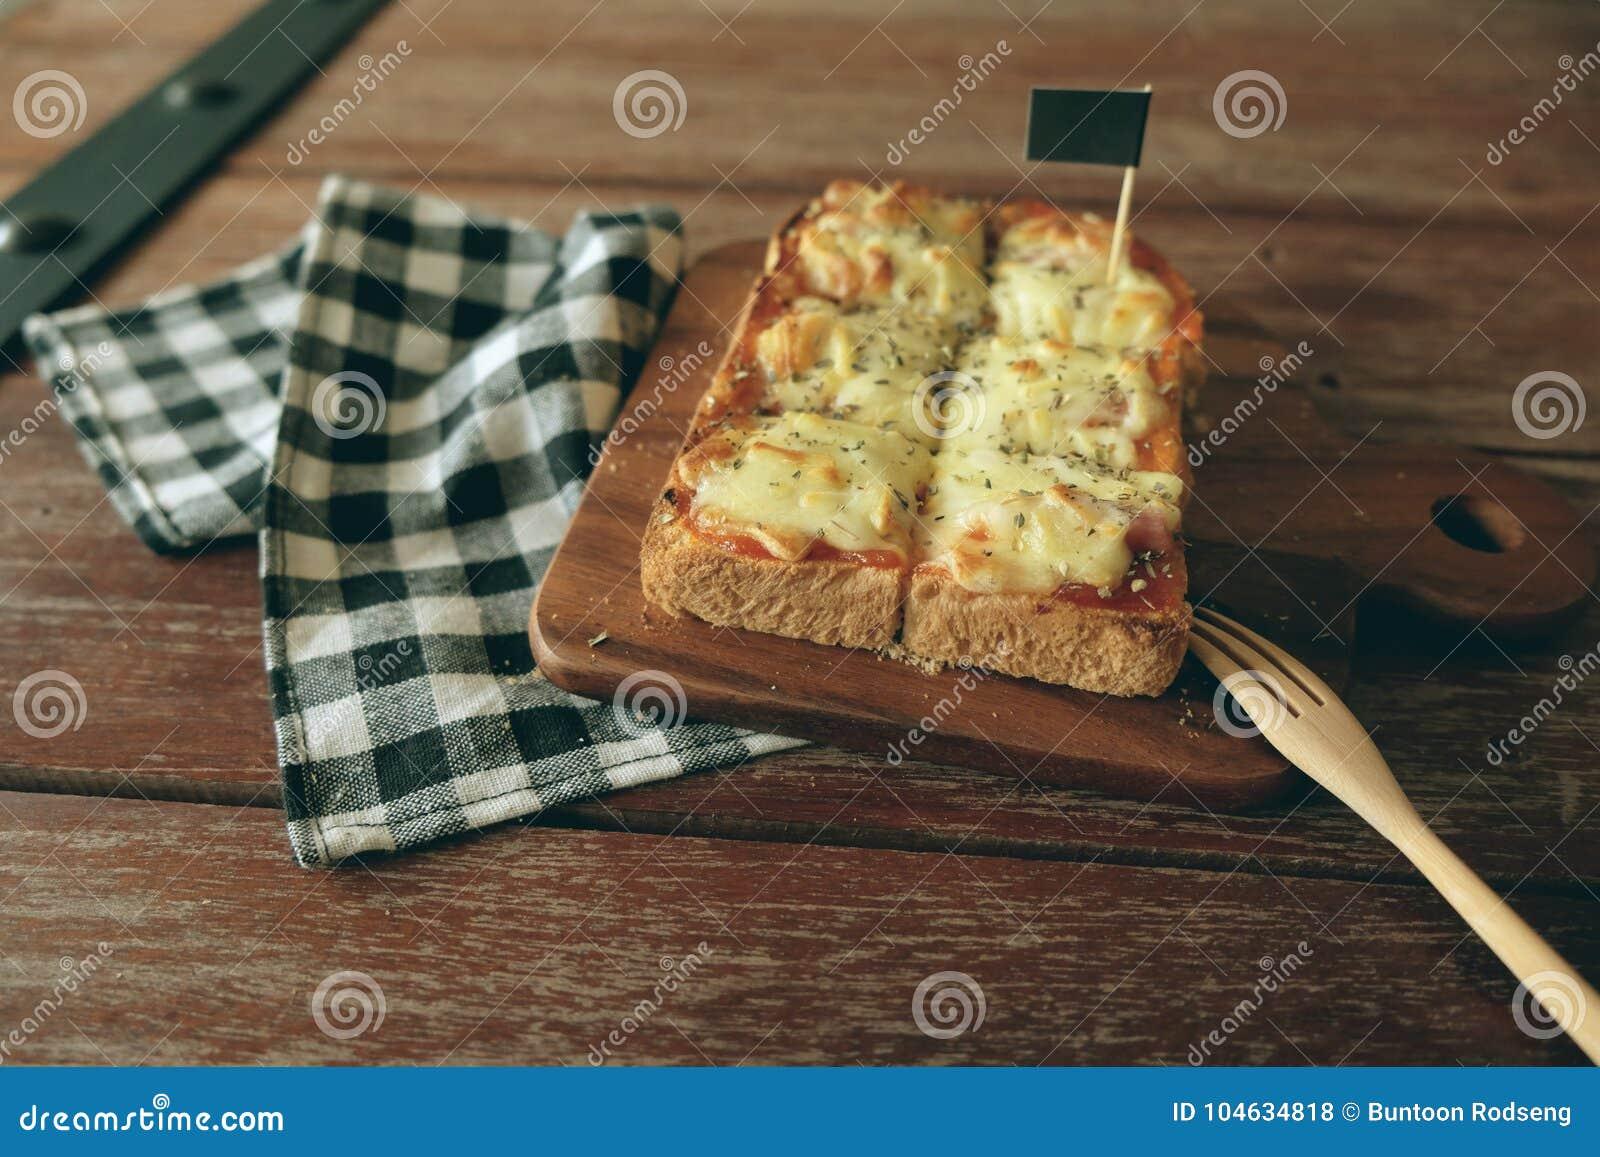 Download Pizza Geroosterd Brood Met Tomatensaus En Hamkaas Stock Foto - Afbeelding bestaande uit rood, naughty: 104634818